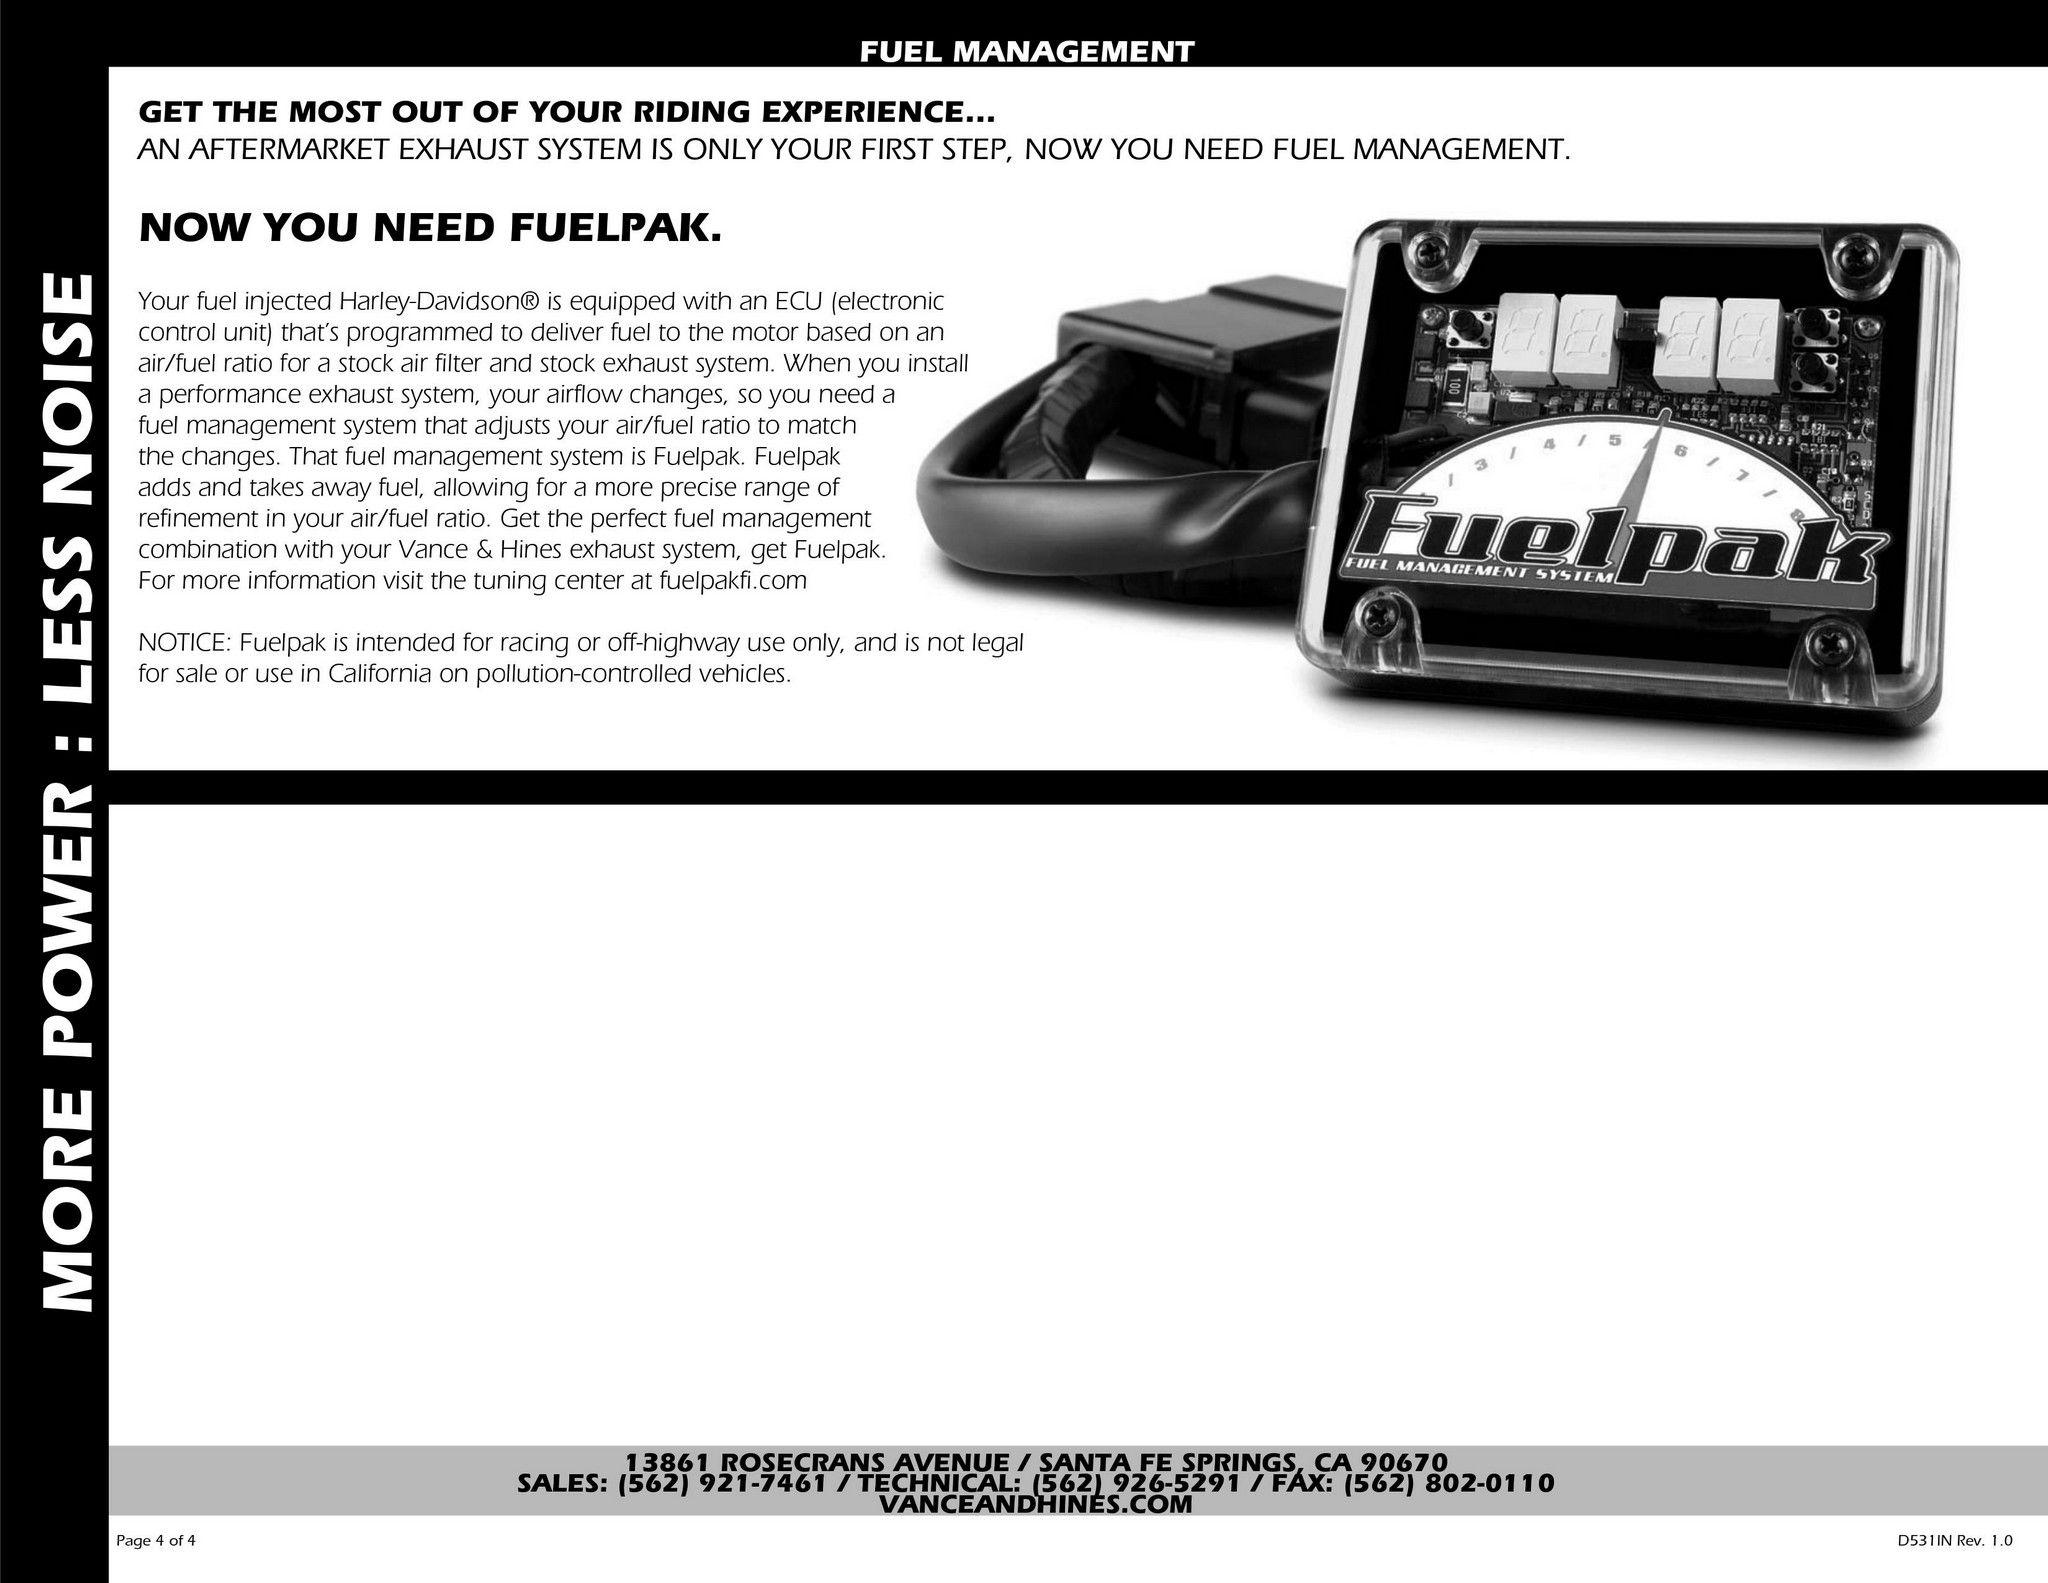 【VANCE&HINES】 SHORTSHOTS STAGGERED BLACK 全段排氣管 - 「Webike-摩托百貨」